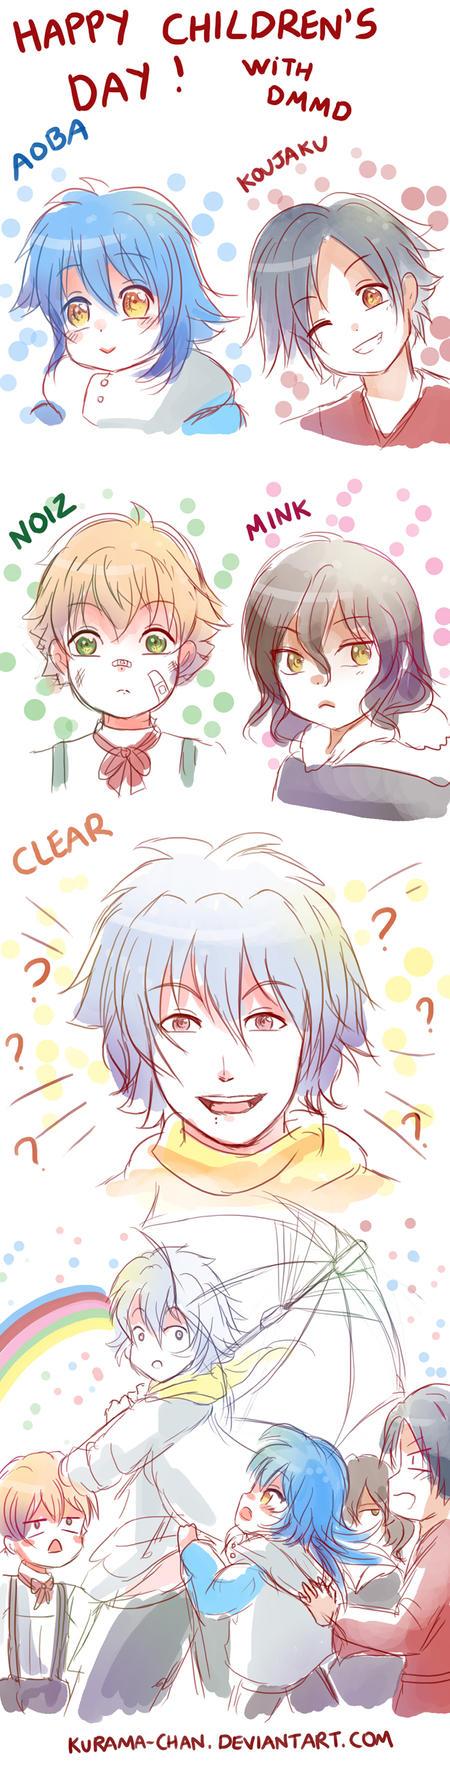 -- DMMD : Happy Children's Day -- by Kurama-chan